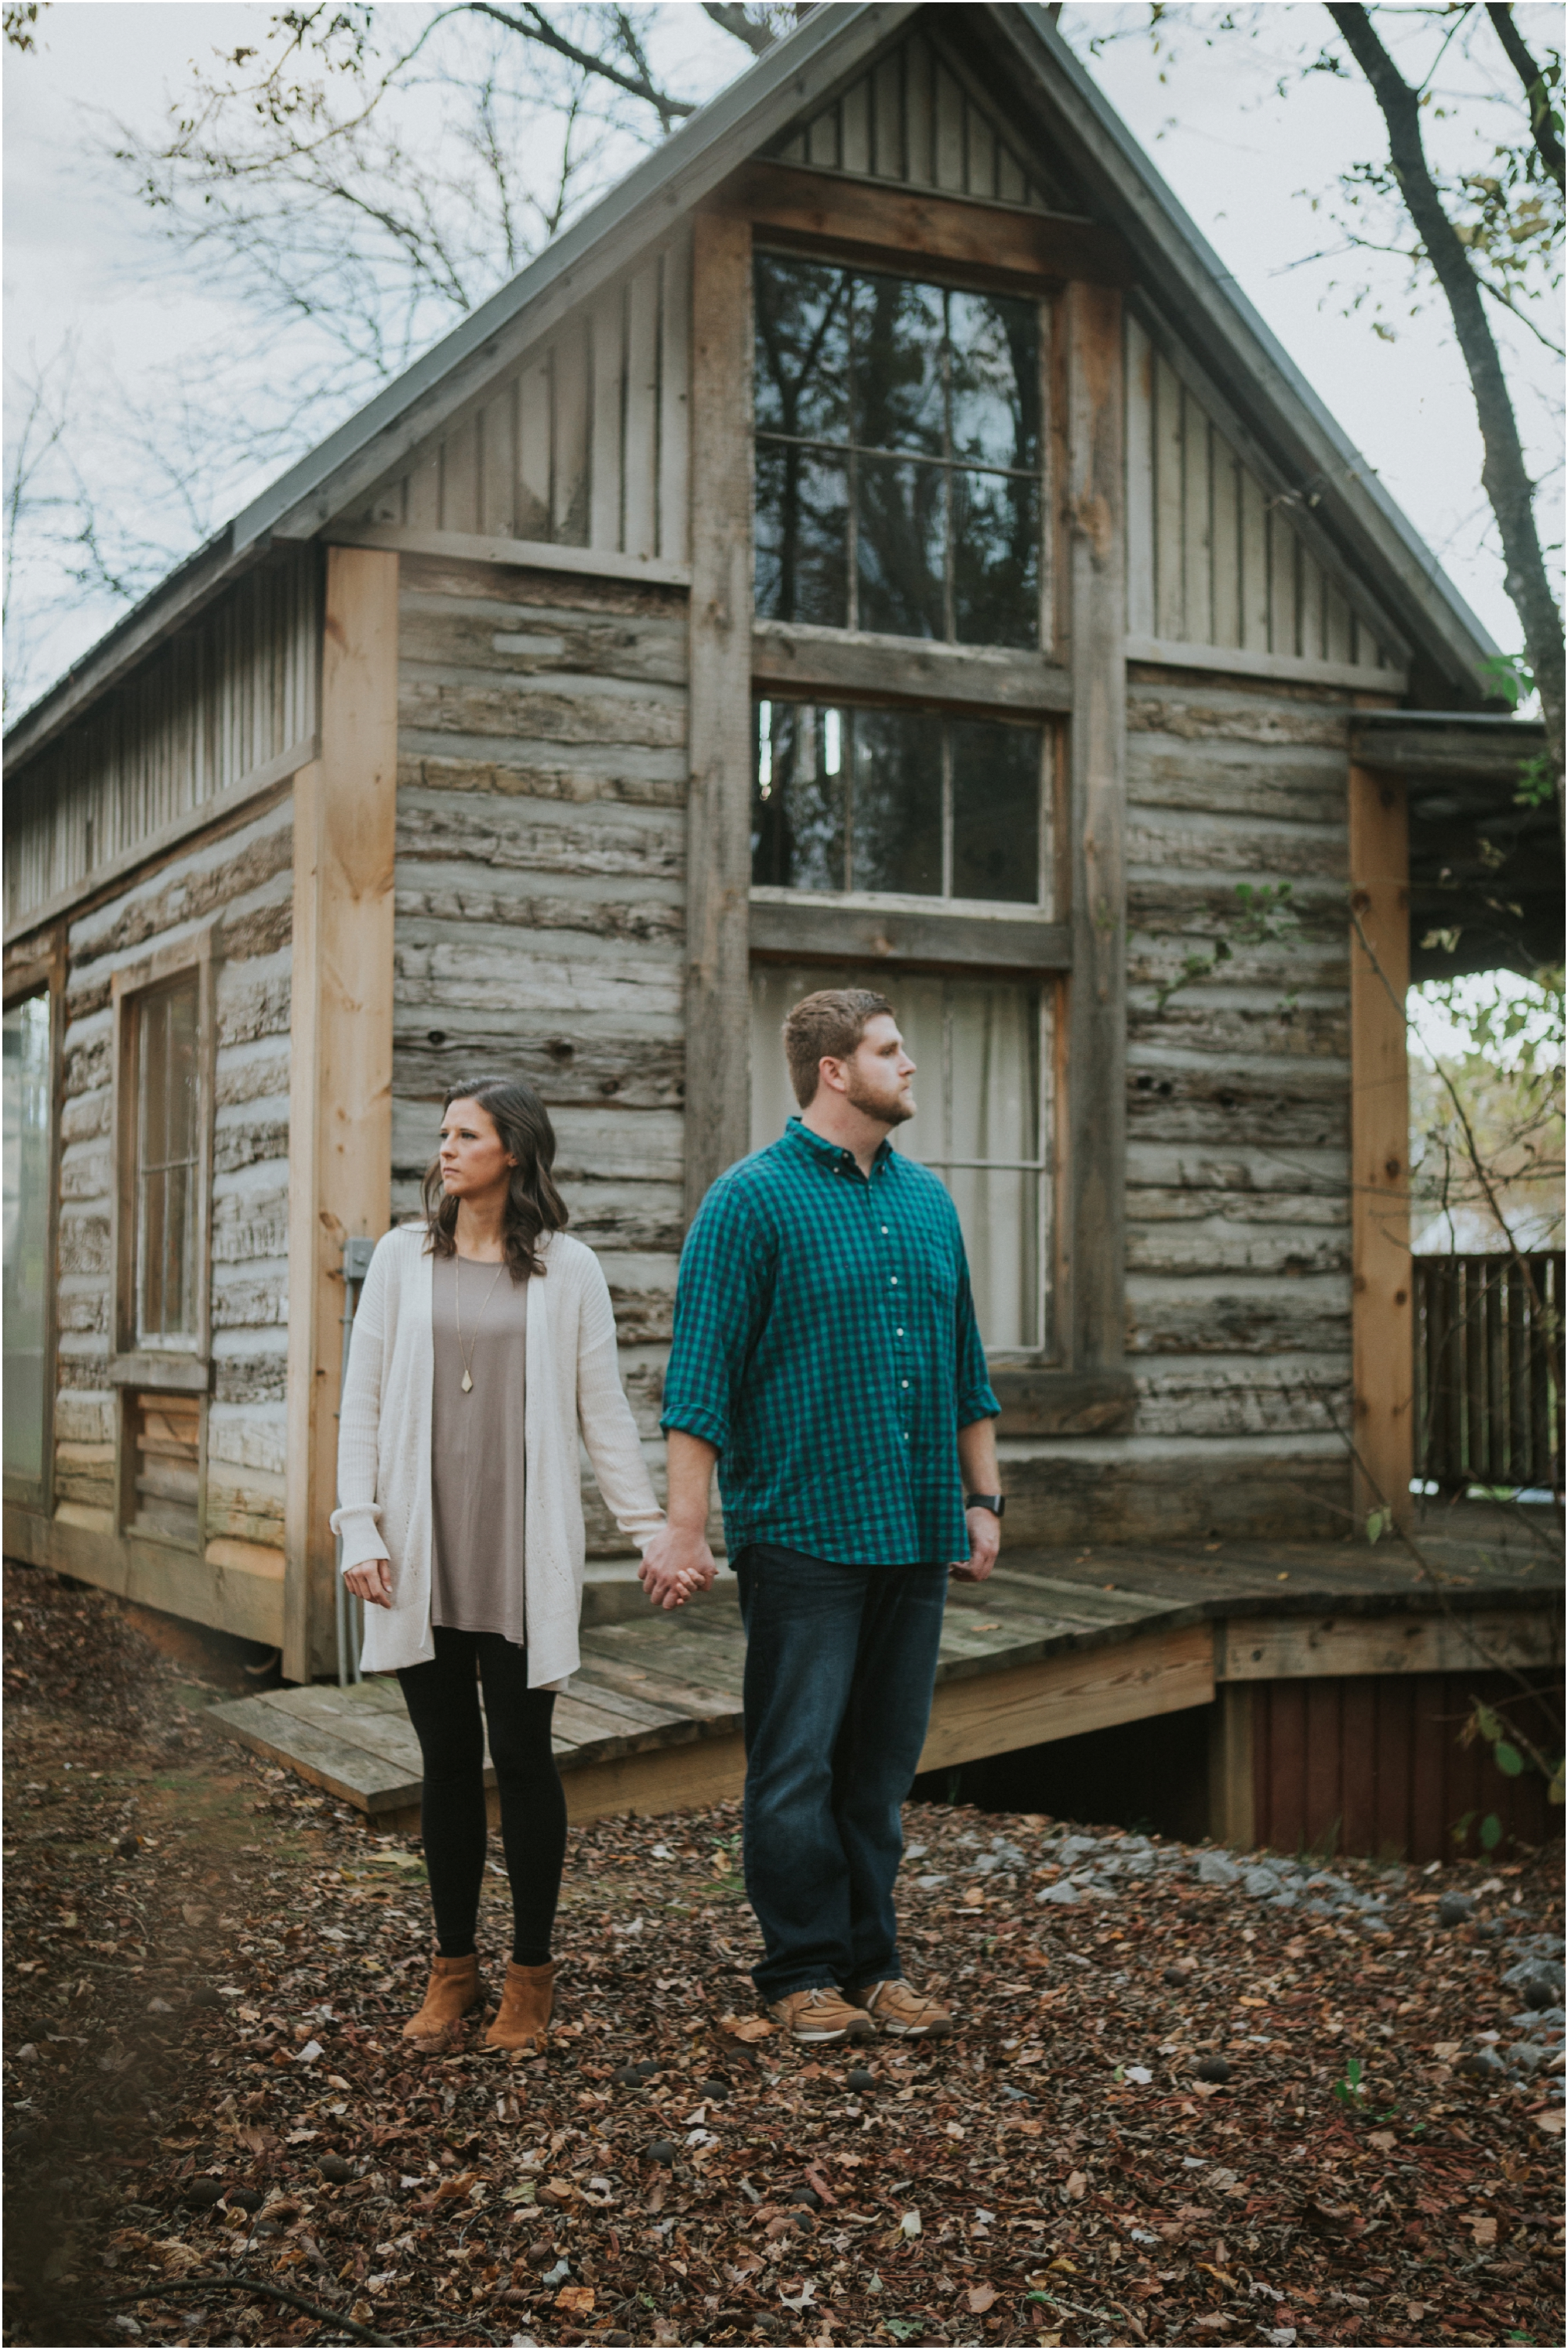 katy-sergent-millstone-limestone-tn-rustic-fall-engagement-session-adventurous-outdoors-intimate-elopement-wedding-northeast-johnson-city-photographer_0029.jpg